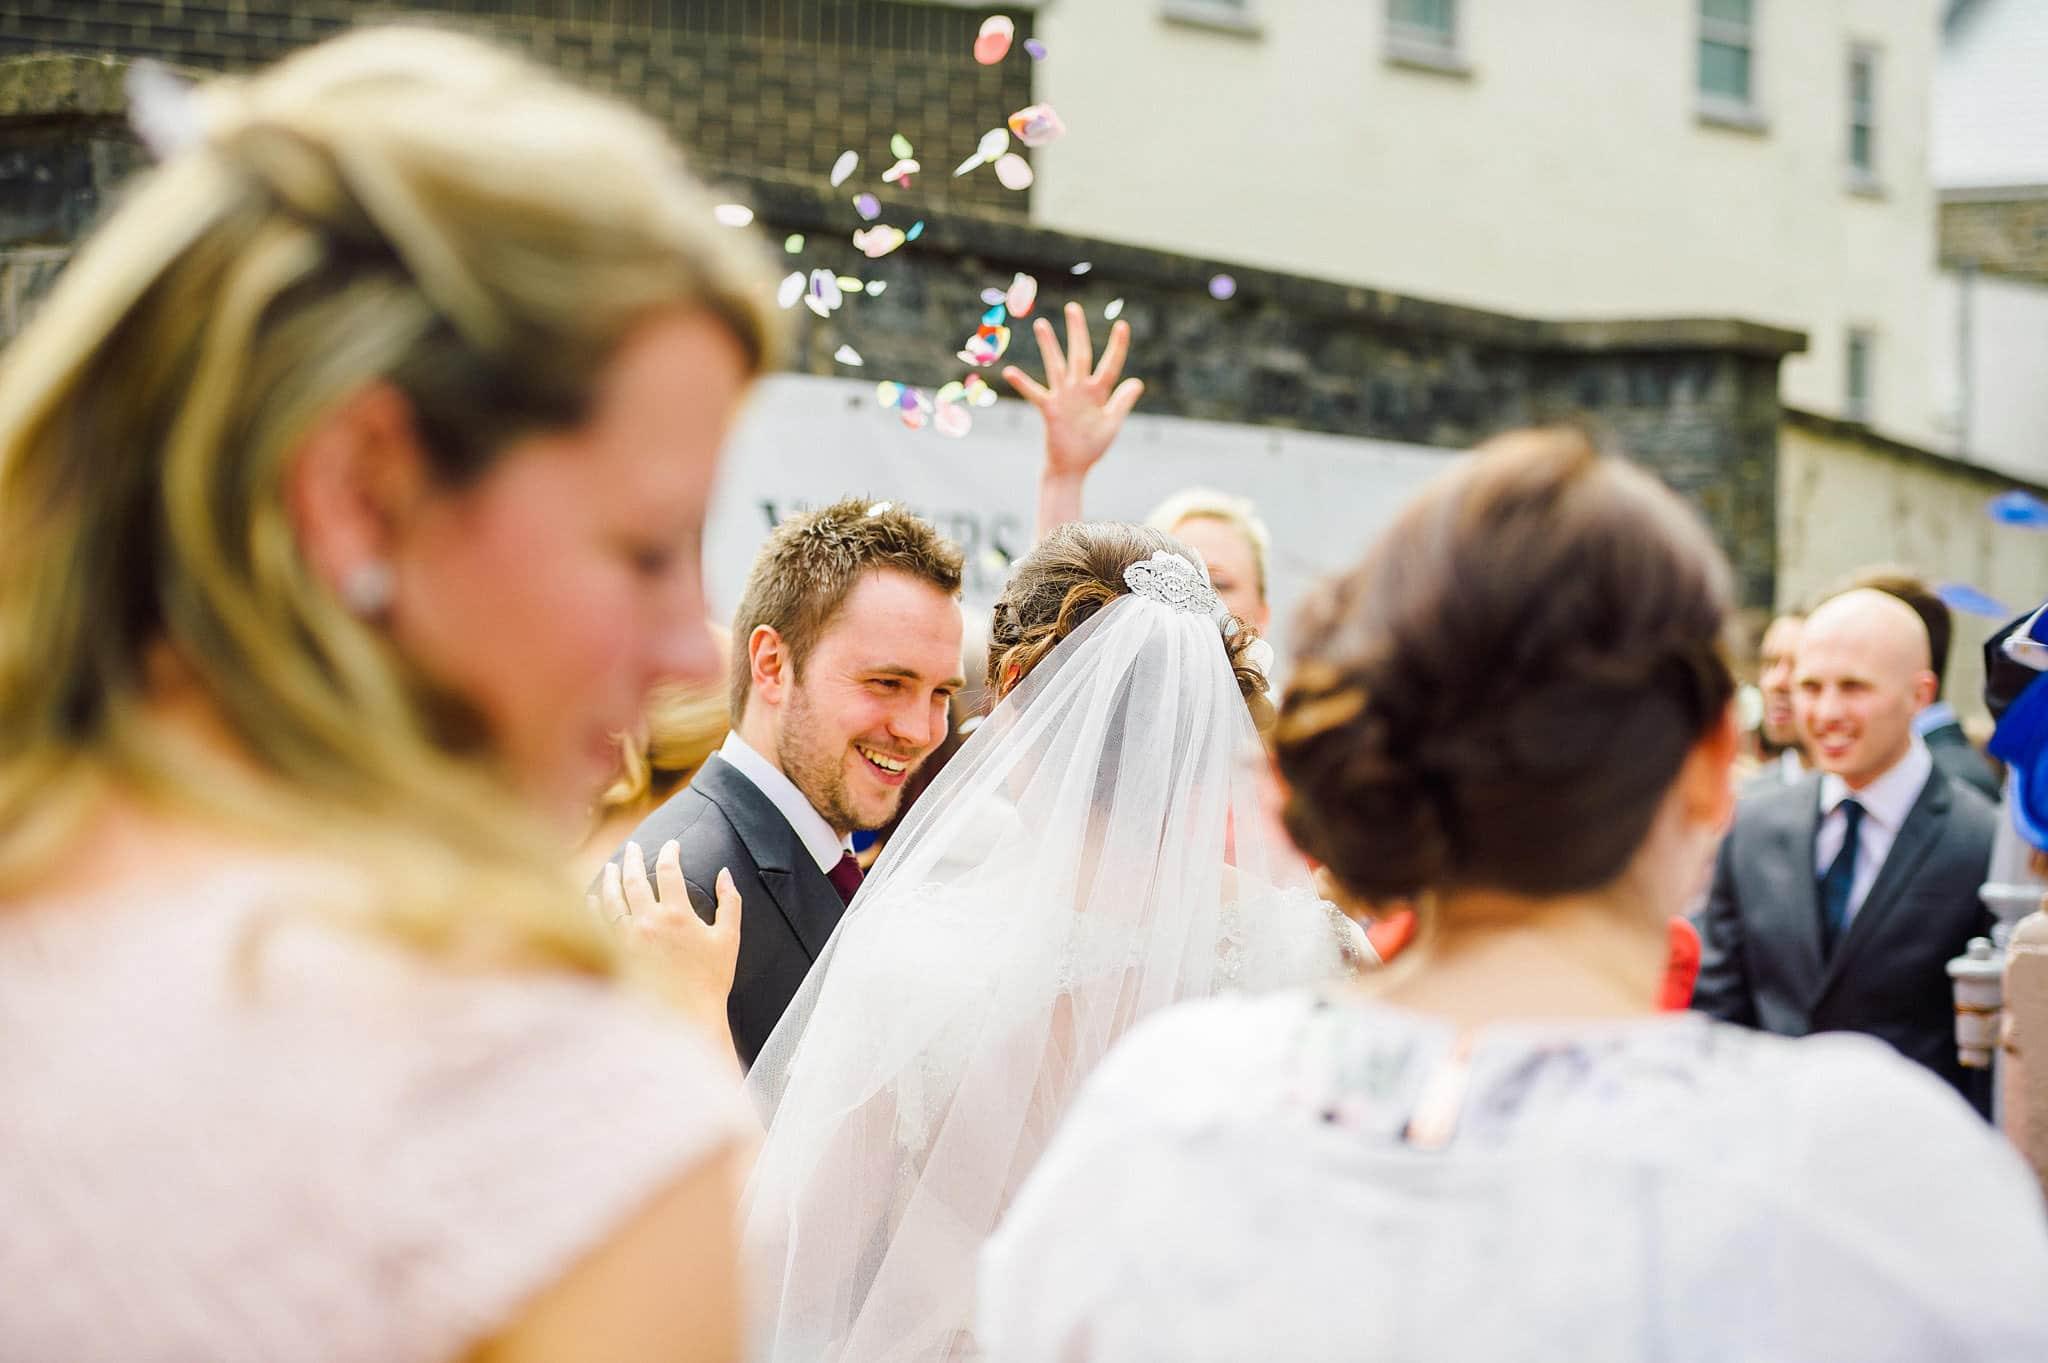 wedding-photographer-aberystwyth-wales (76)